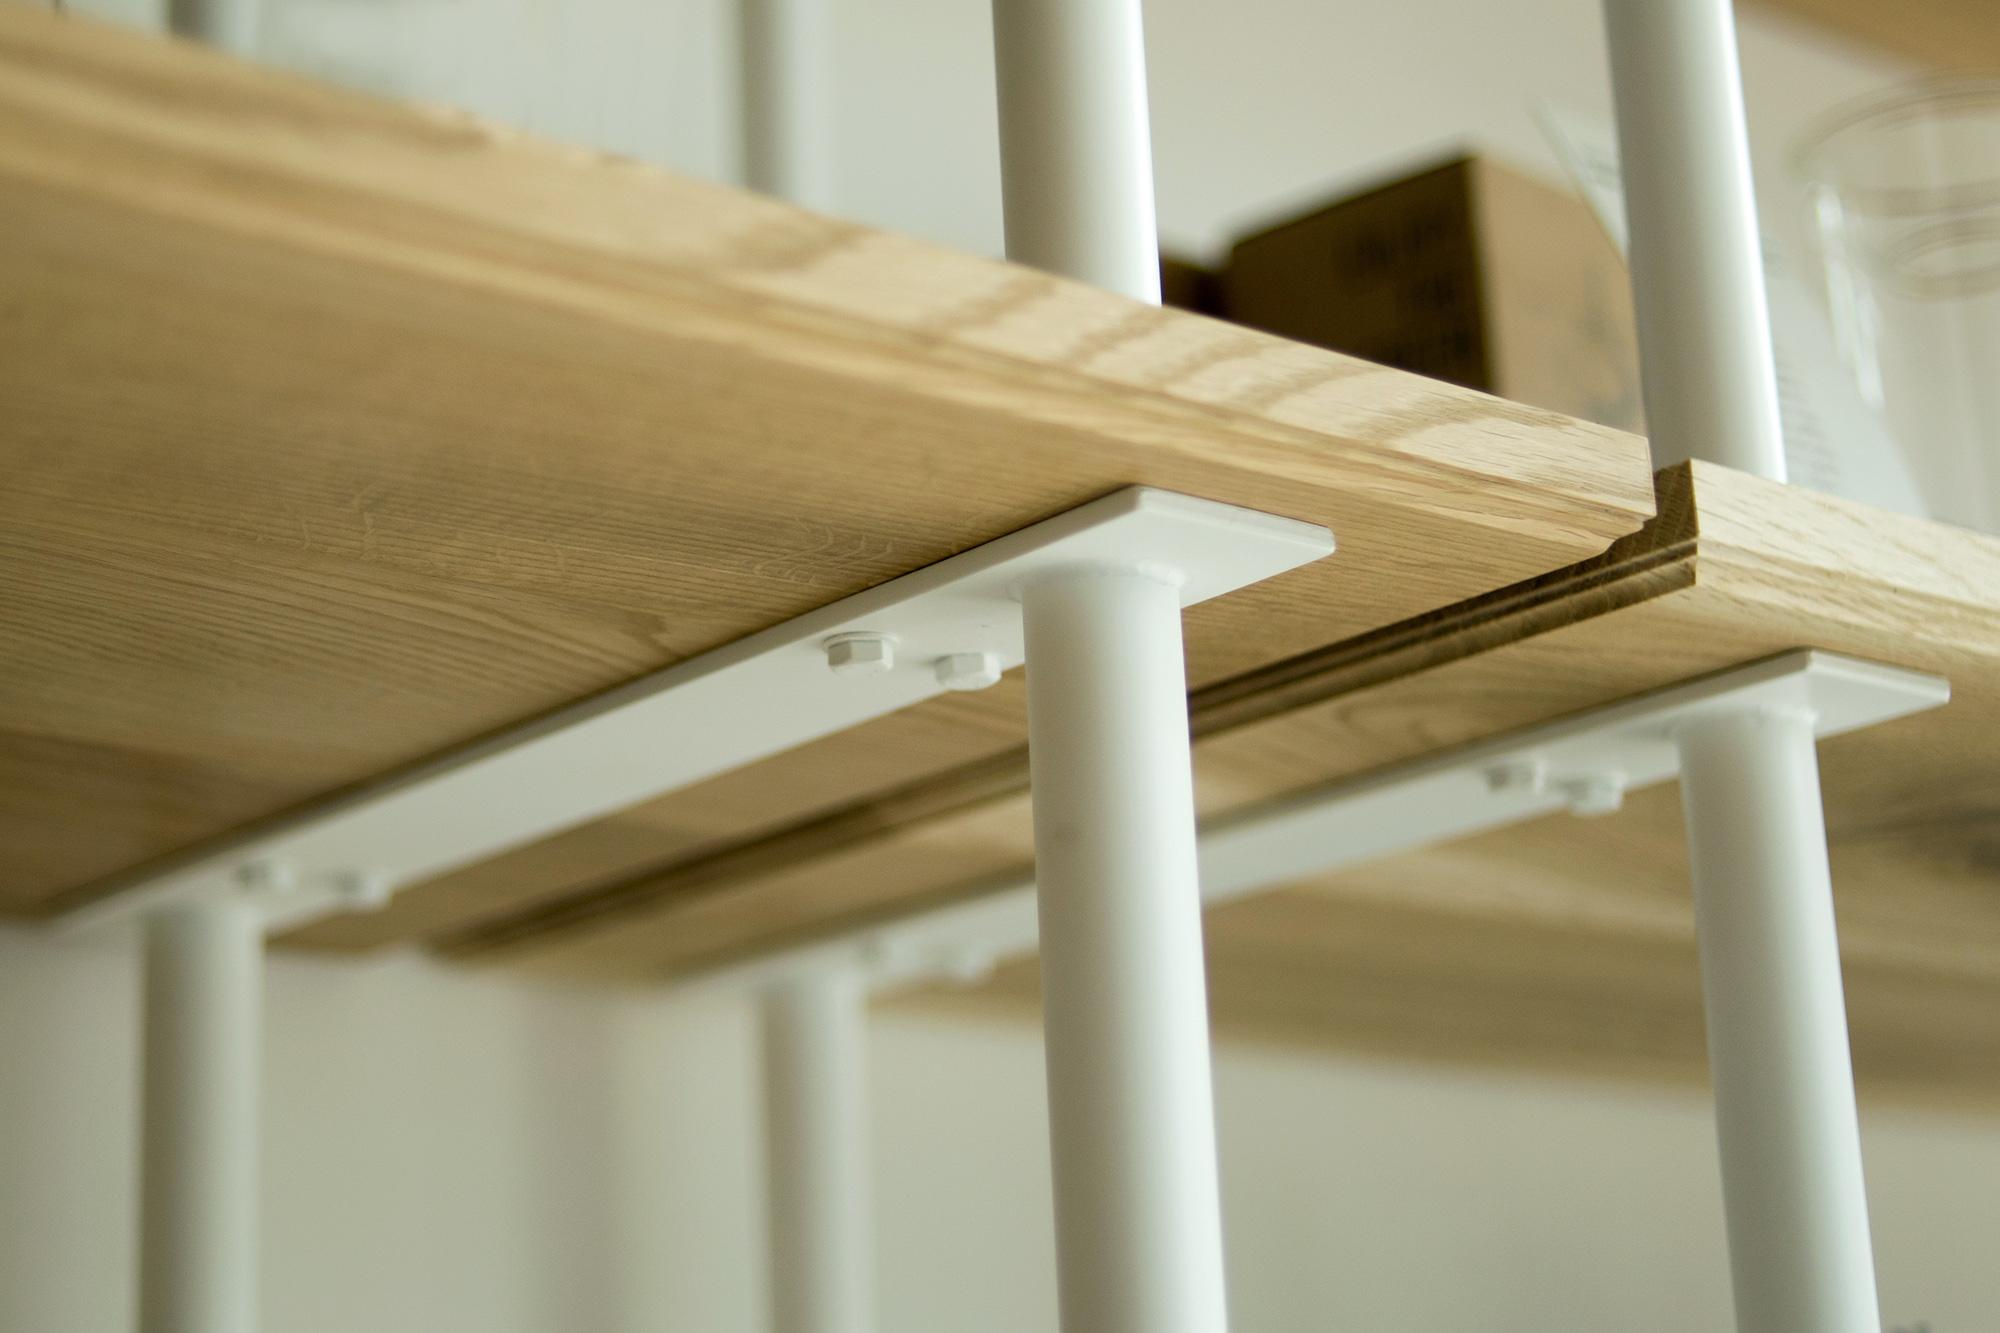 WOODWORK build rack ビルドラック ジョイント部分